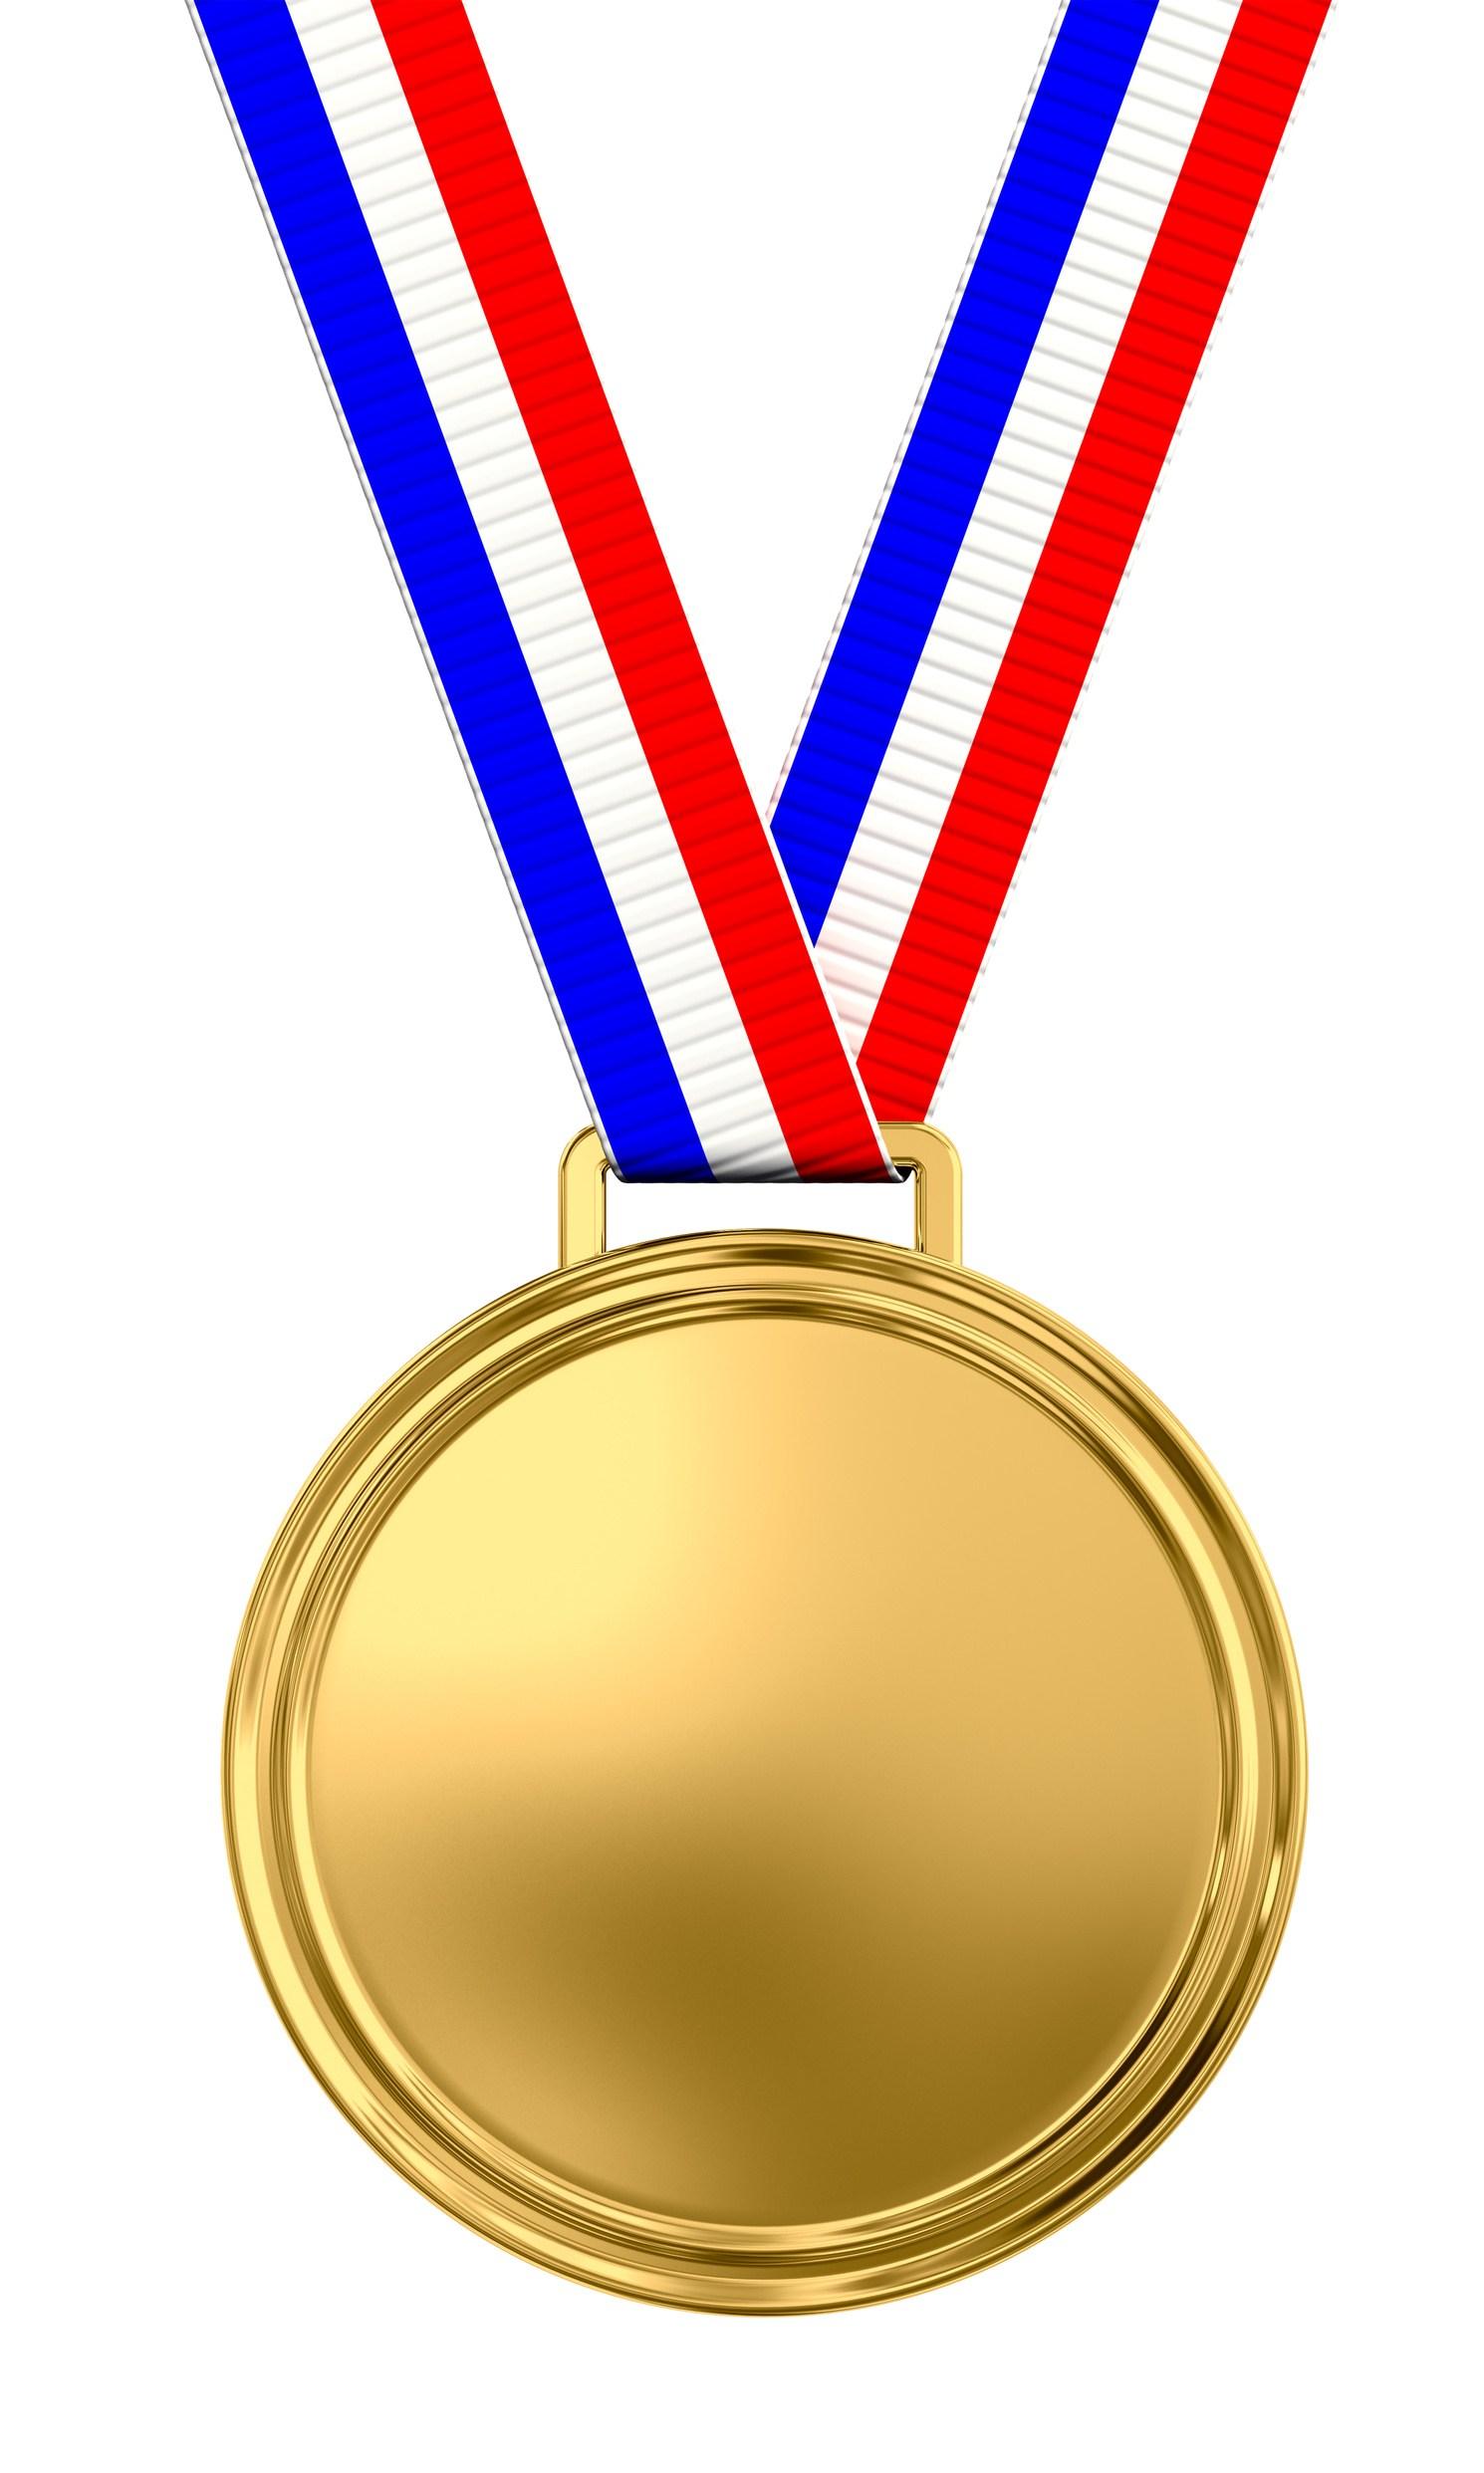 Medal clipart medal stand. Transparent